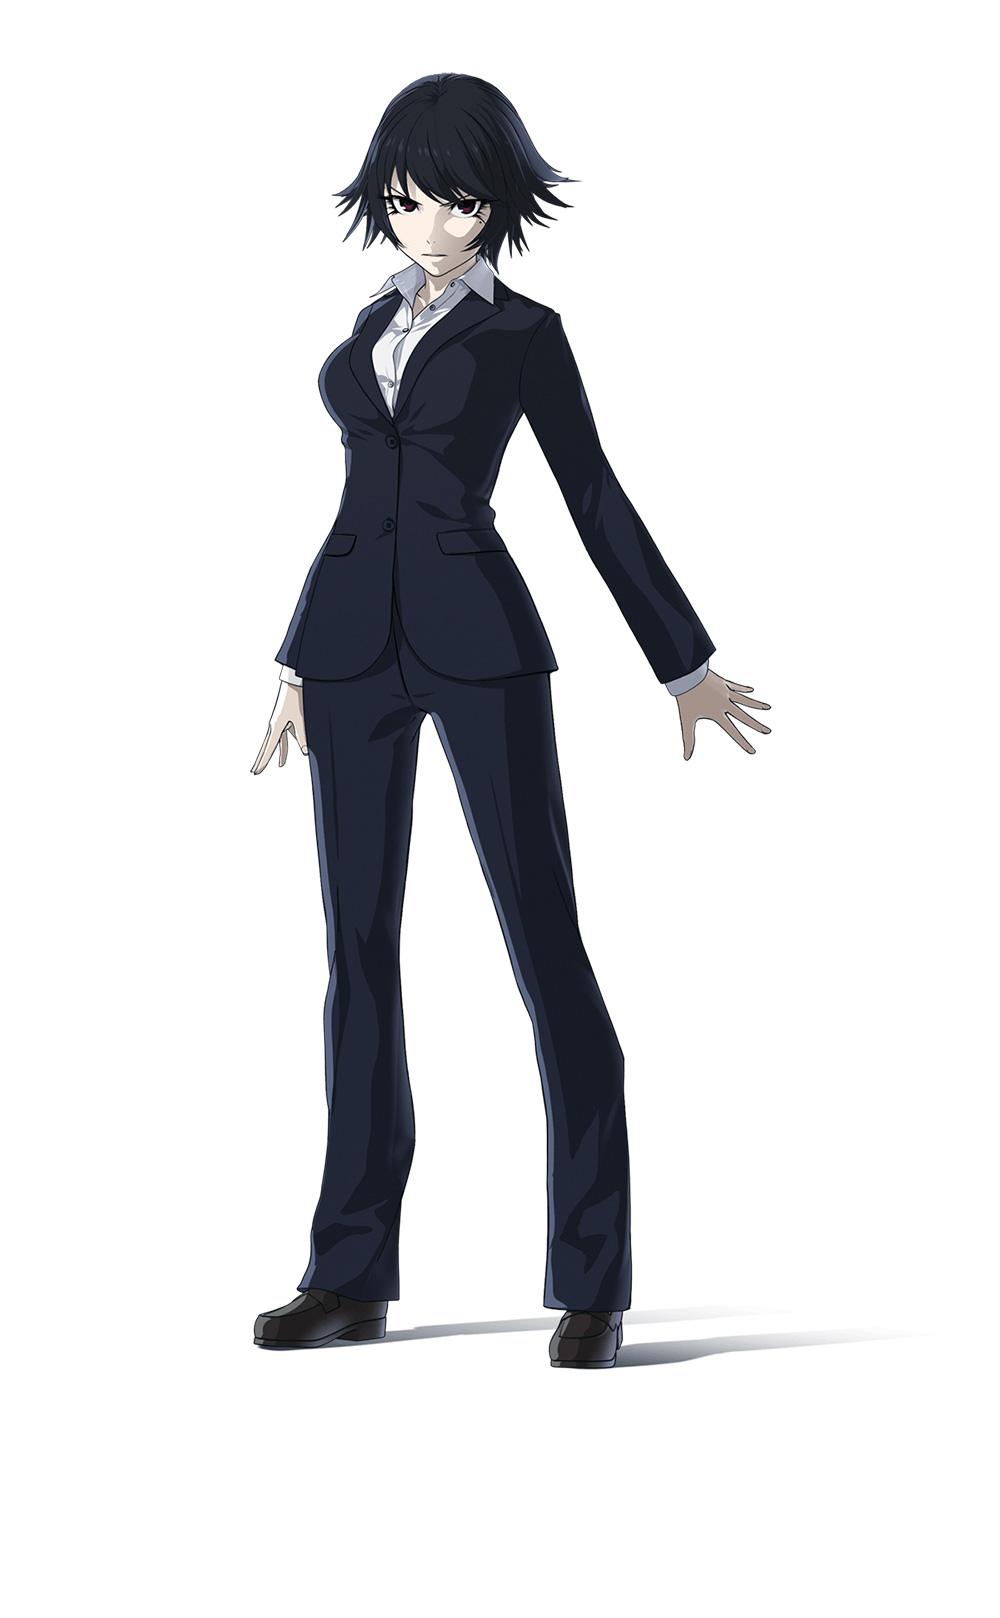 Ajin-Anime-Character-Designs-Izumi-Shimomura